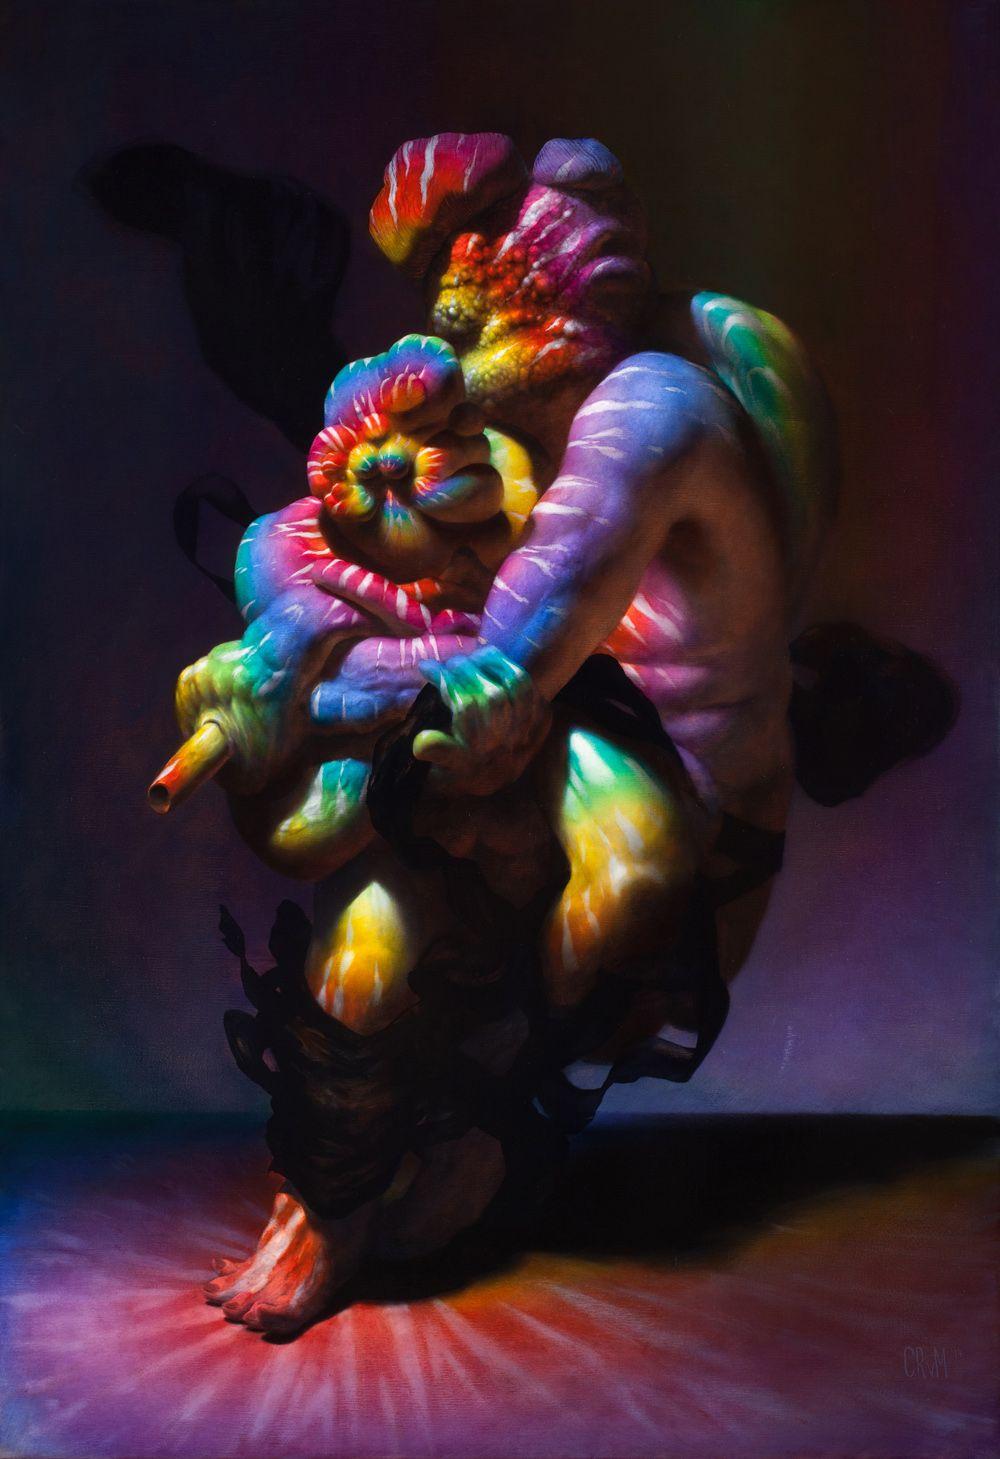 Found Footage: Psychedelic Americana Body Horror by Christian Rex van Minnen | ARTE Creative